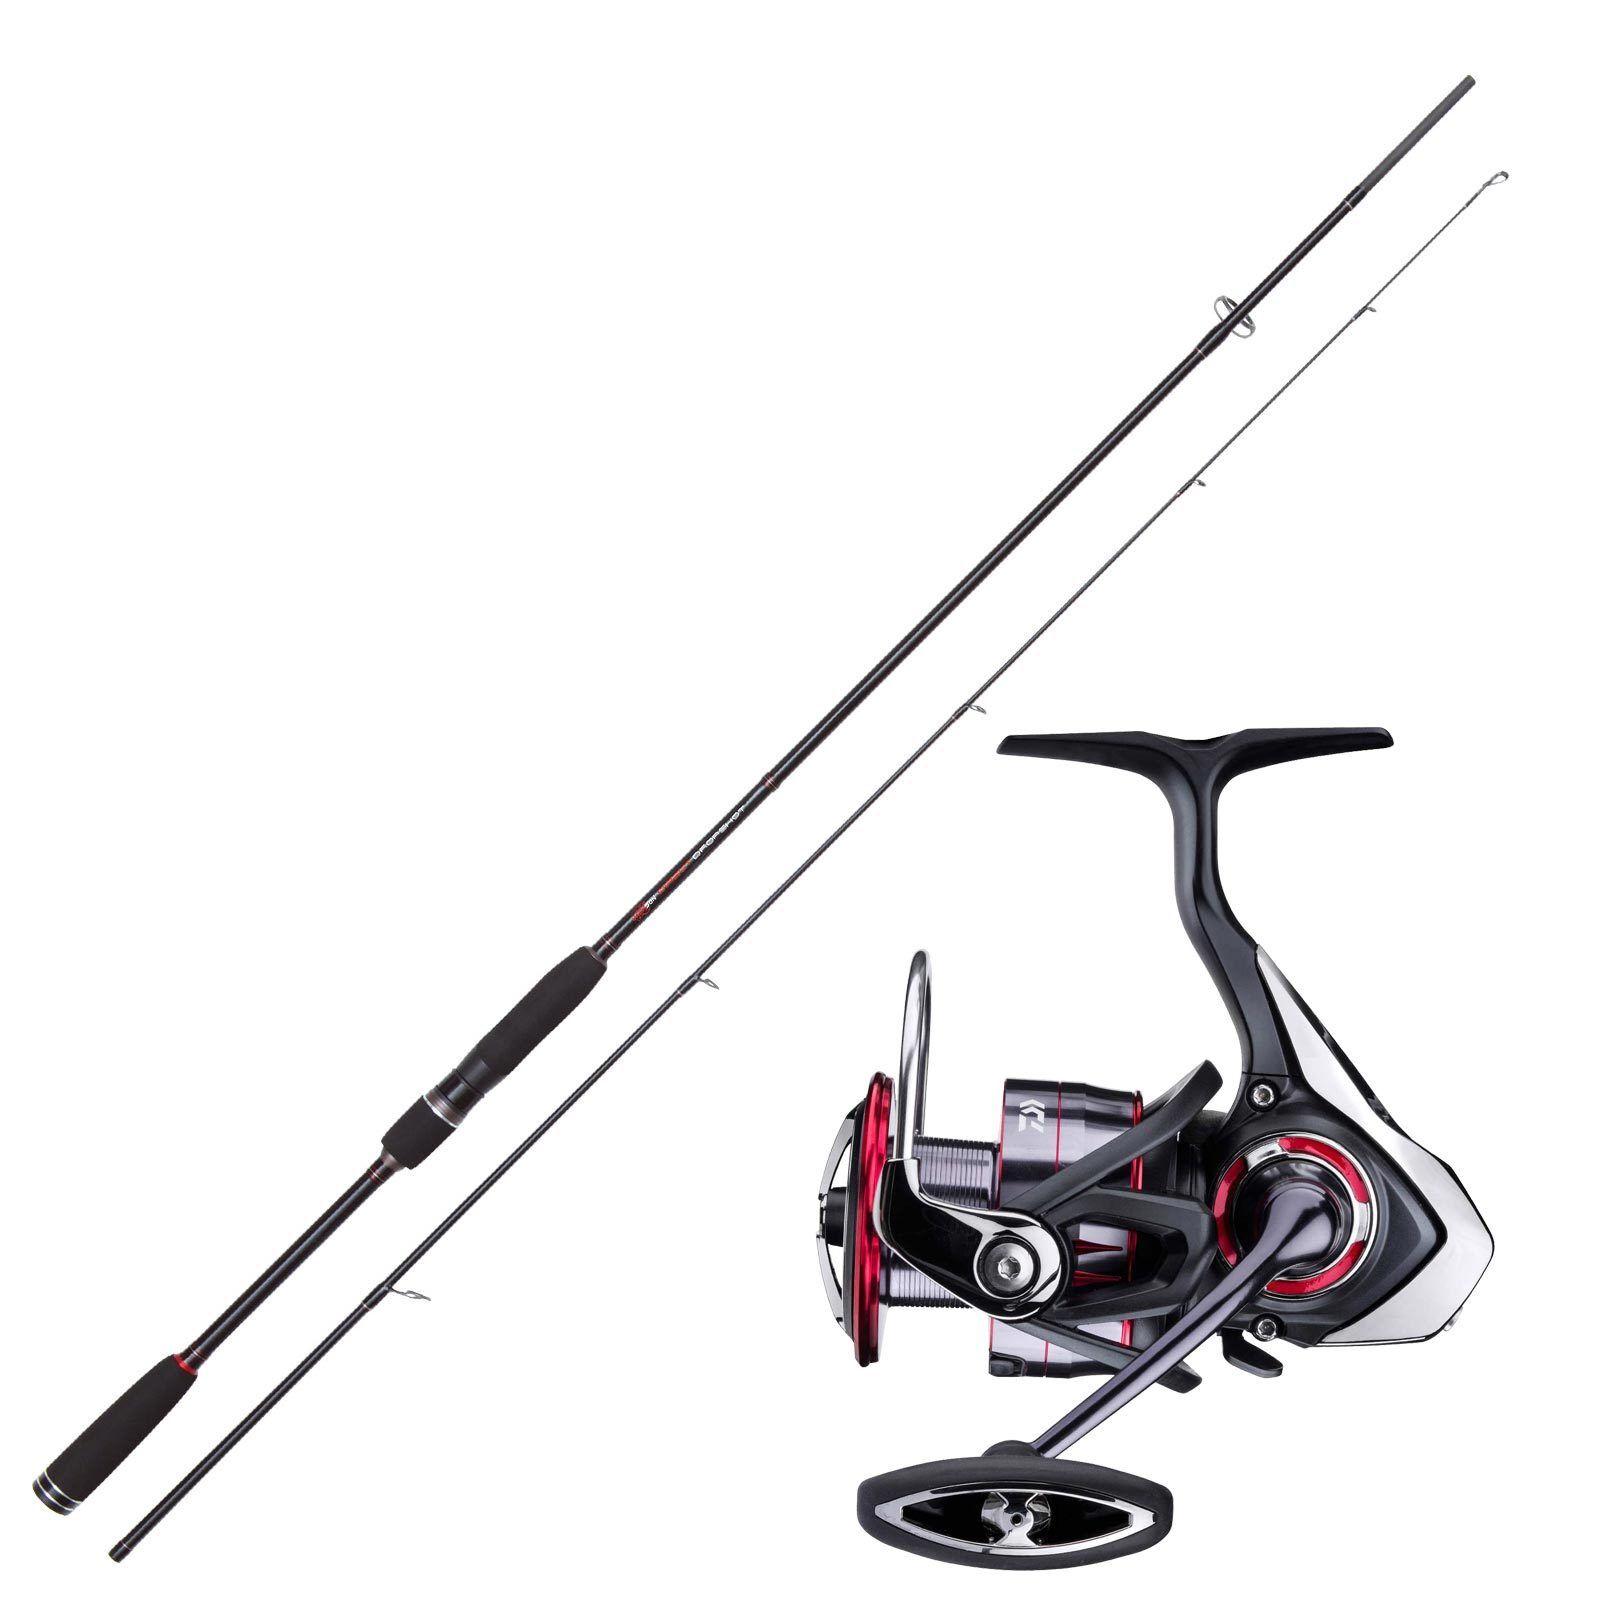 Set de pesca drop shot Jackson Drop Shot barra 2, 13 m con combo de Cocherete de pesca Daiwa